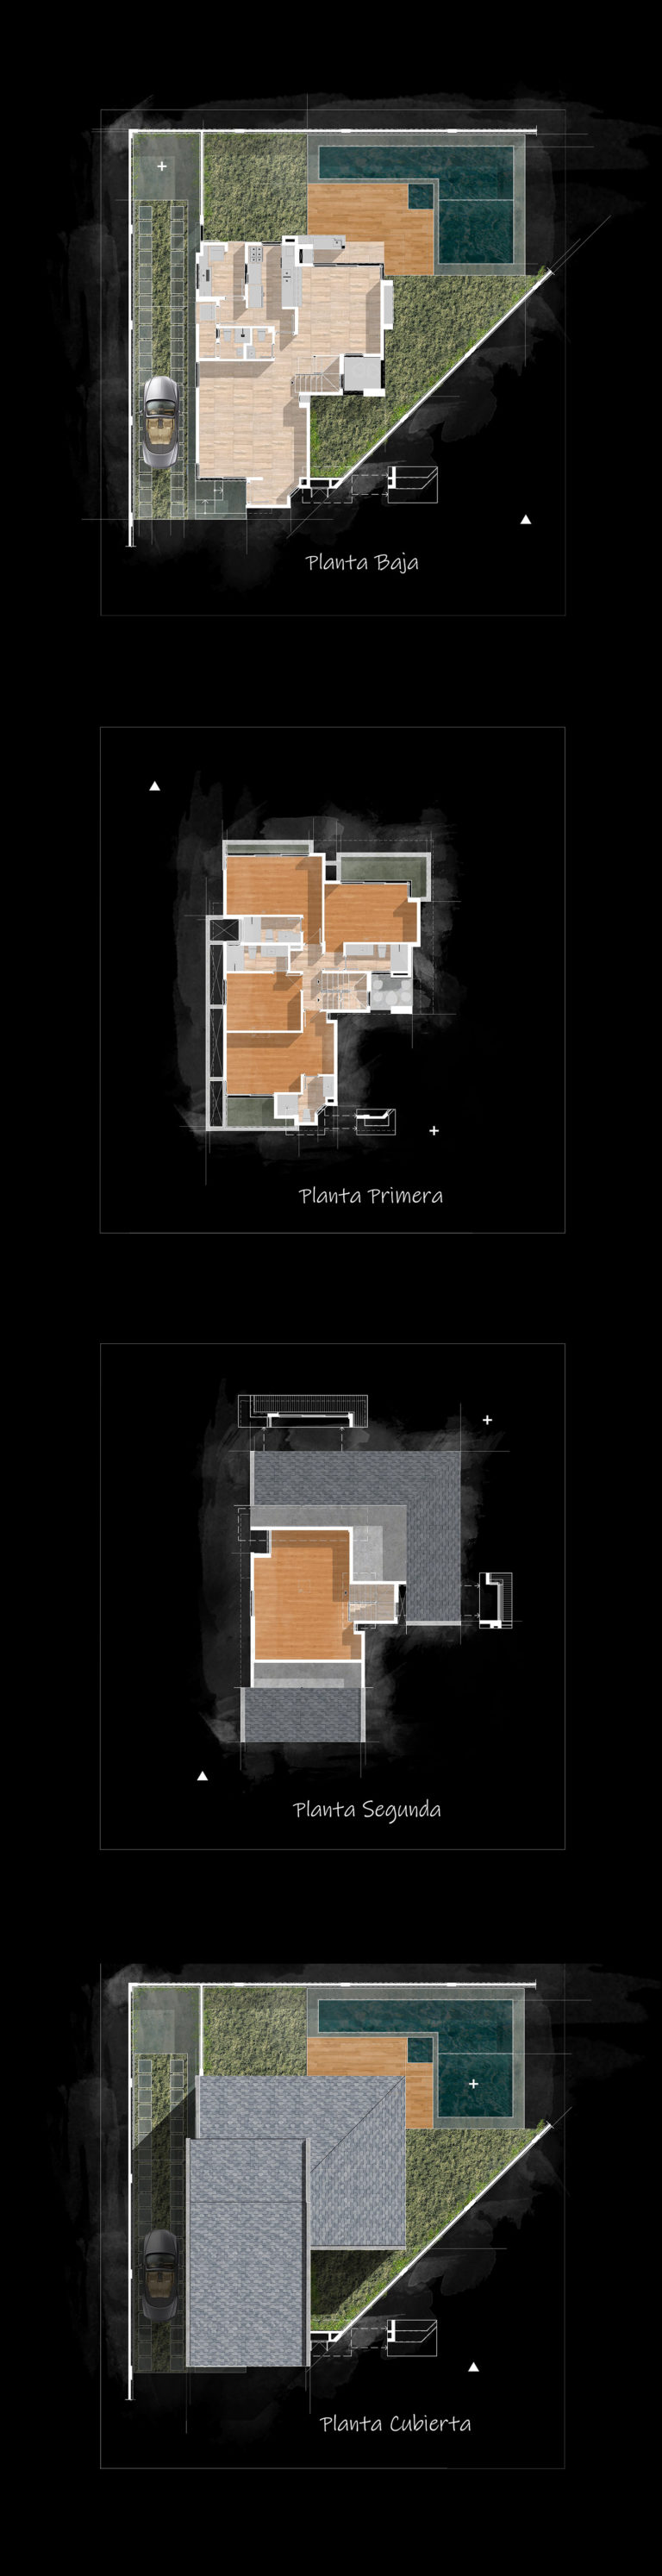 planimetria residencial enjoy_Alvaro de la Cruz Arquitectura y Diseño